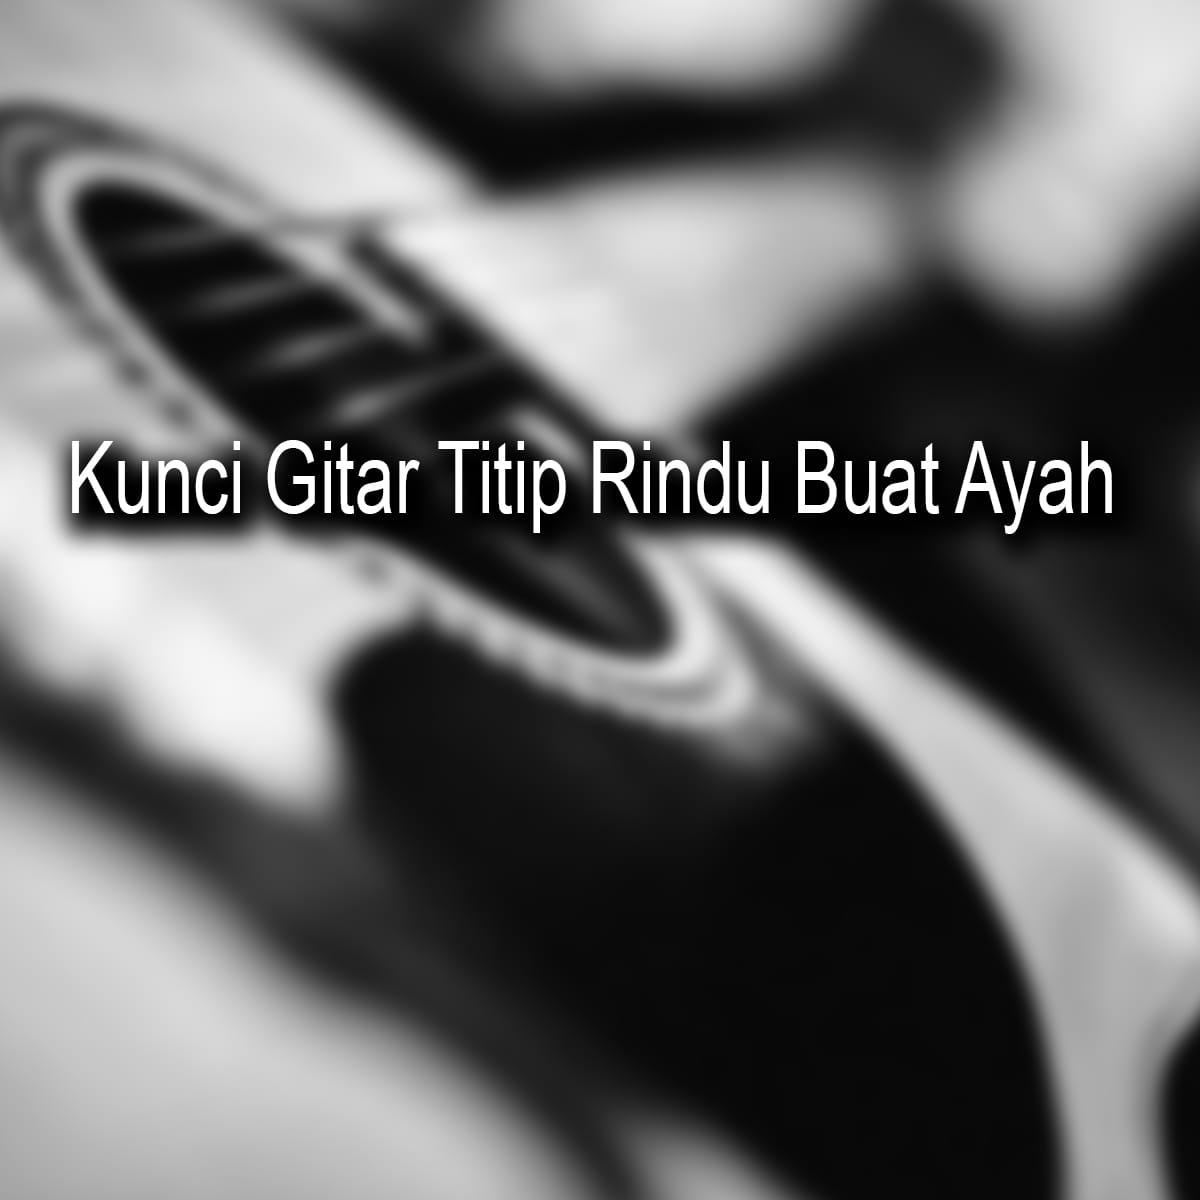 Chord Kunci Gitar Titip Rindu Buat Ayah - Ebiet G.Ade